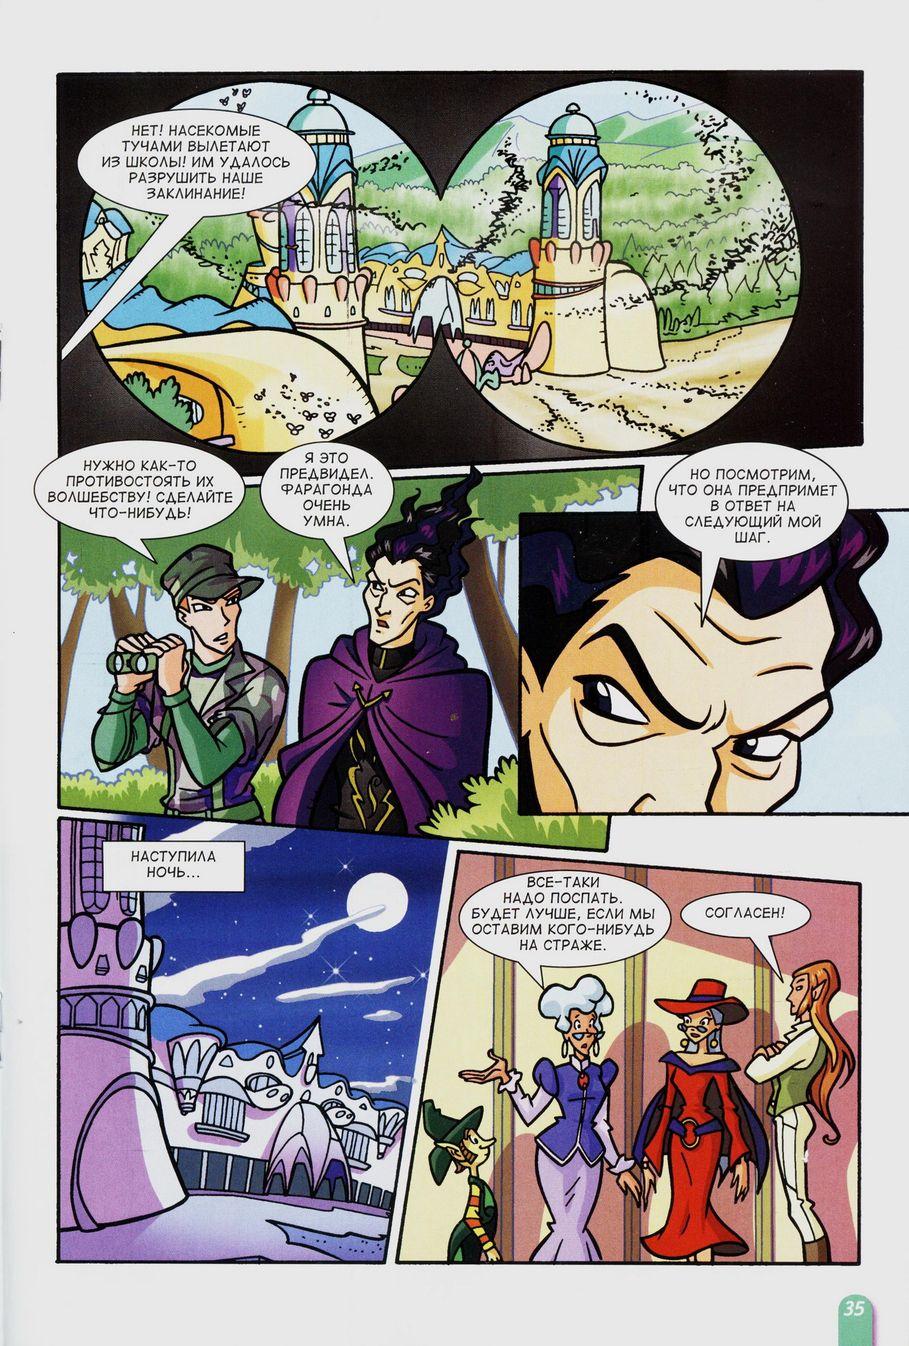 Комикс Винкс Winx - Волшебник Камуд (Журнал Винкс №6 2011) - стр. 35